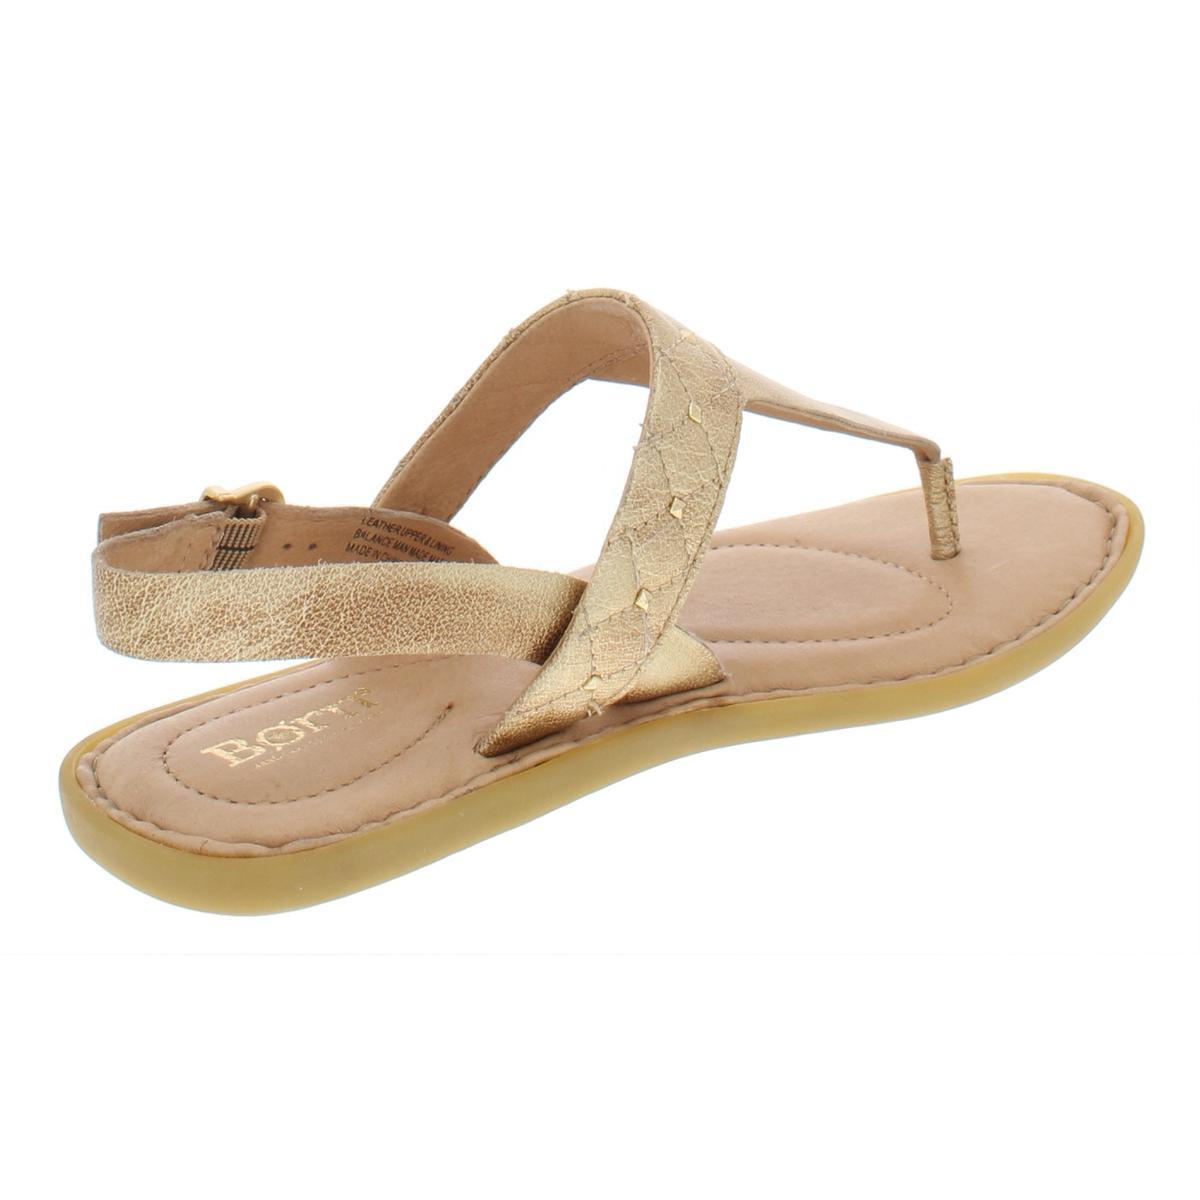 Born-Womens-Garren-Leather-Slingback-Flats-Thong-Sandals-Shoes-BHFO-5209 thumbnail 4